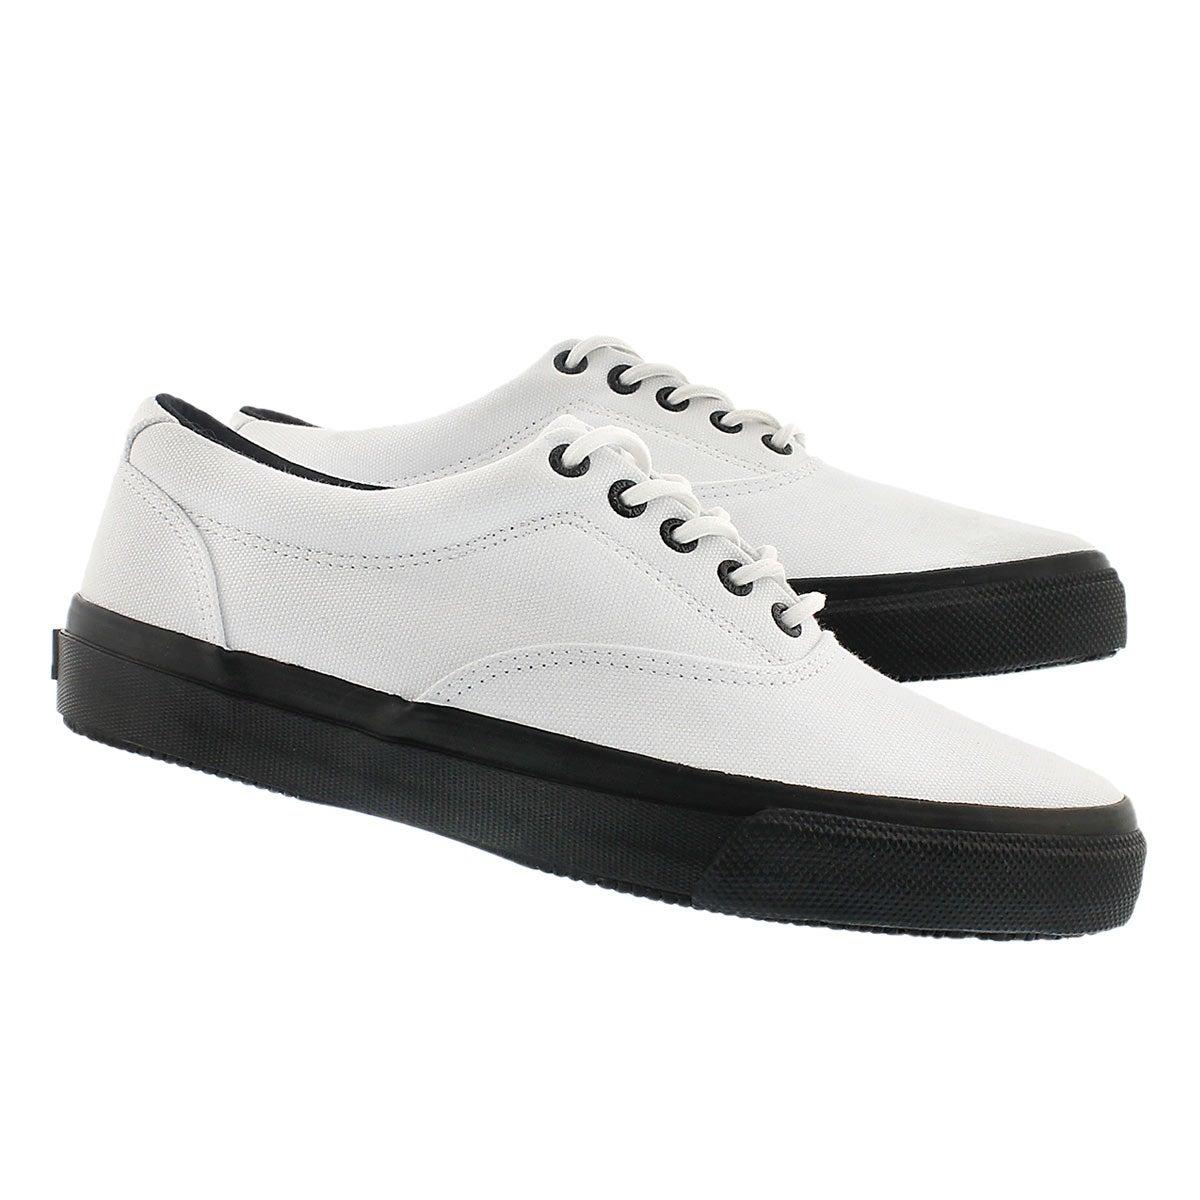 Mns Striper CVO wht/blk sneaker